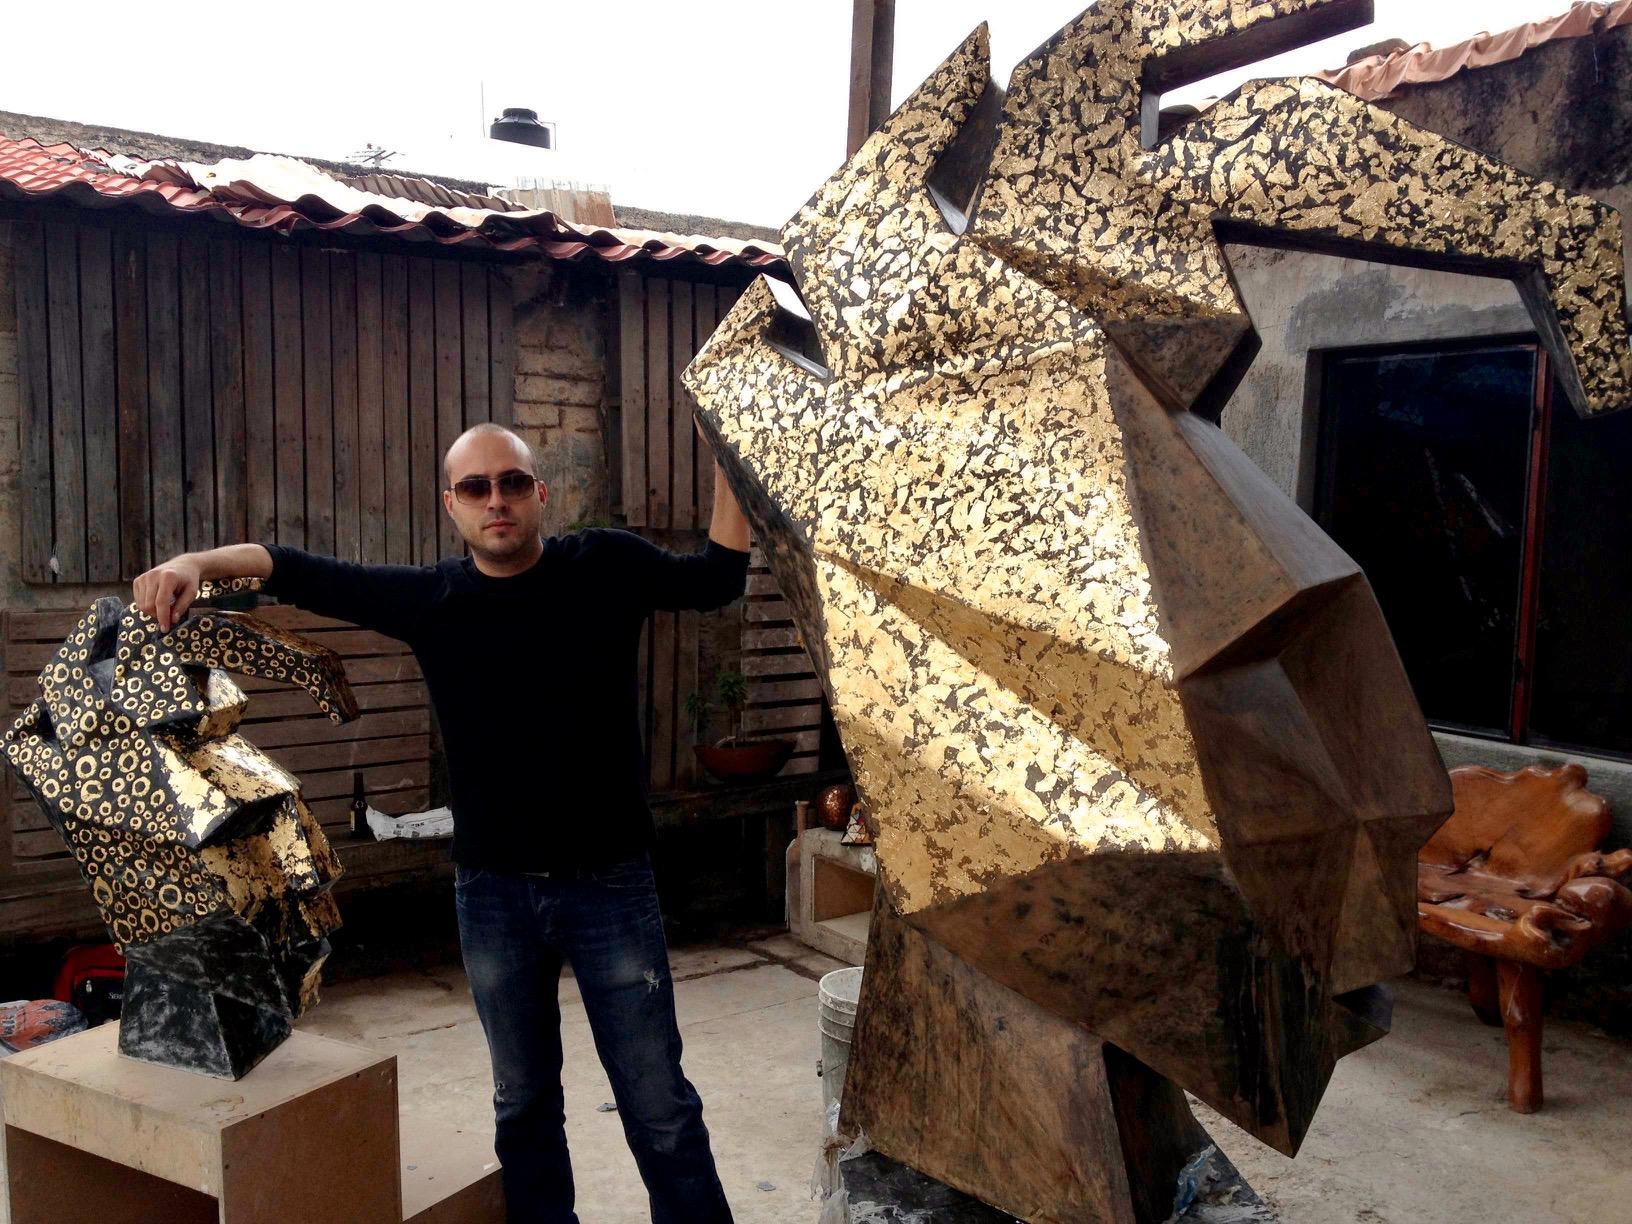 paul-zepeda-with-pakal-sculptures.jpg